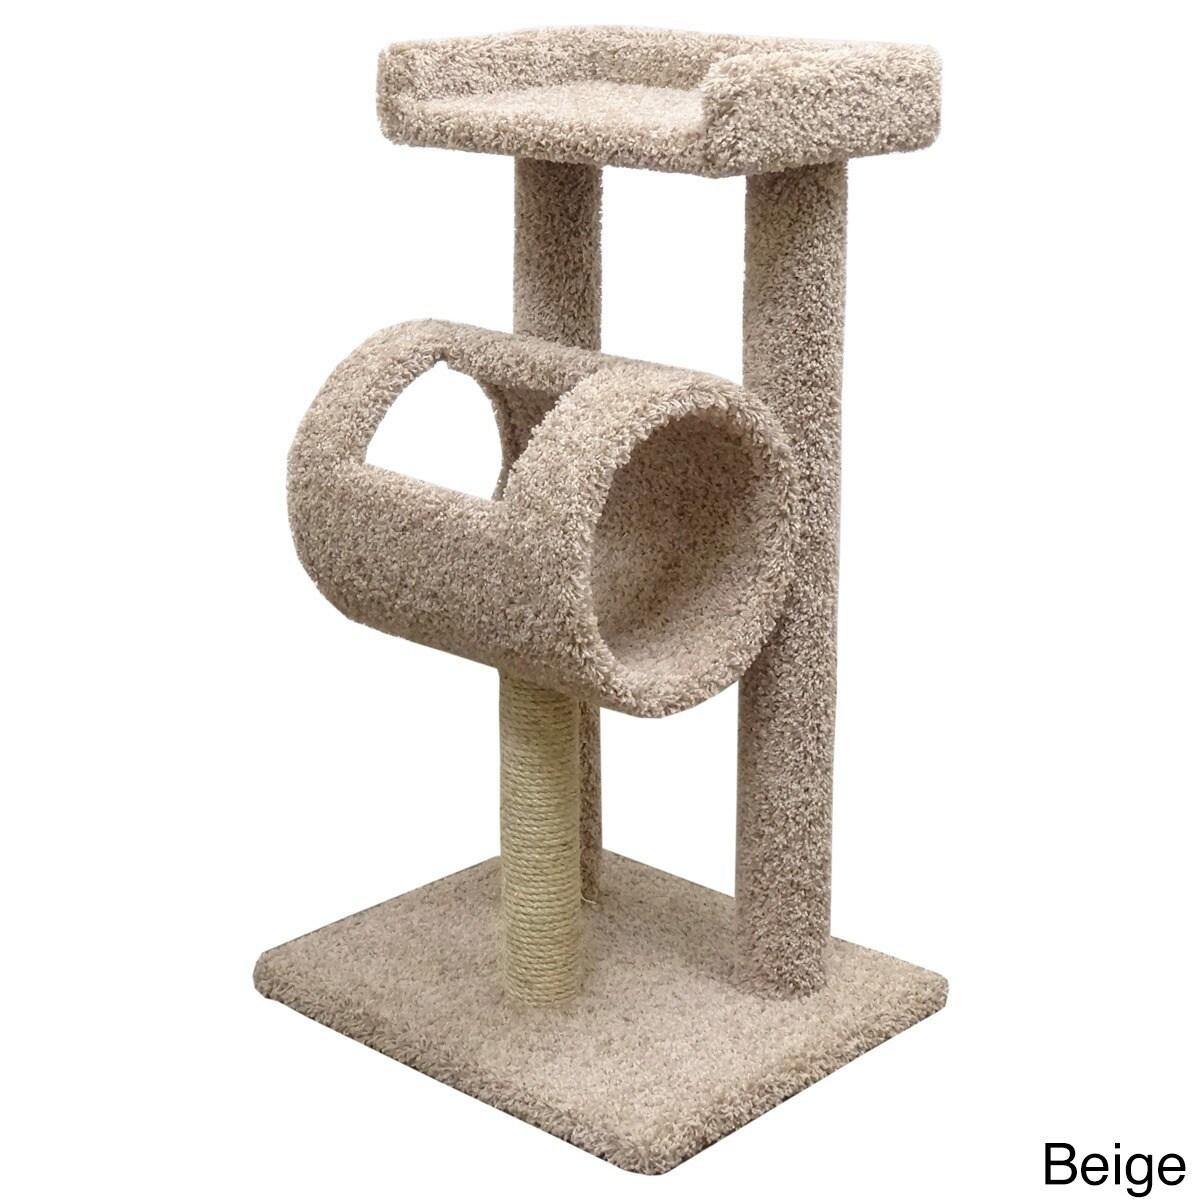 New Cat Condos Premeire Cat Climber Cat Tree (Beige), Brown